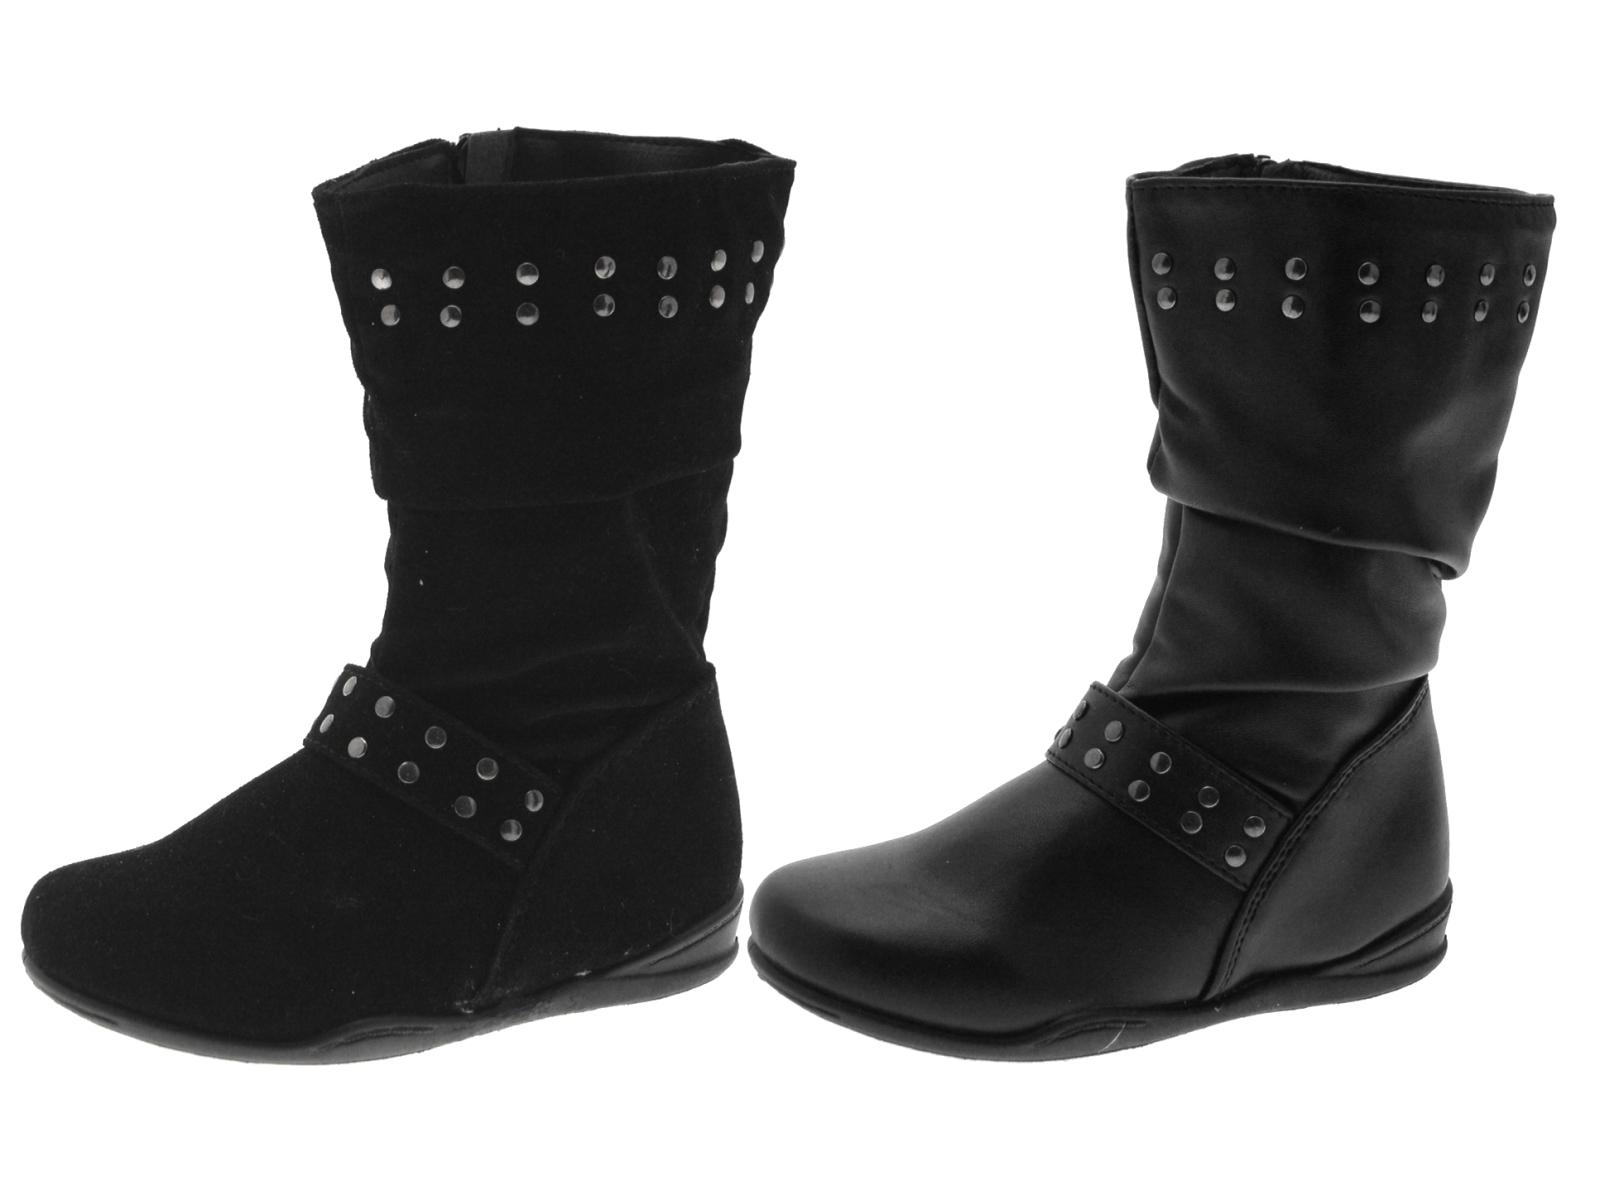 Black boots size 4 uk